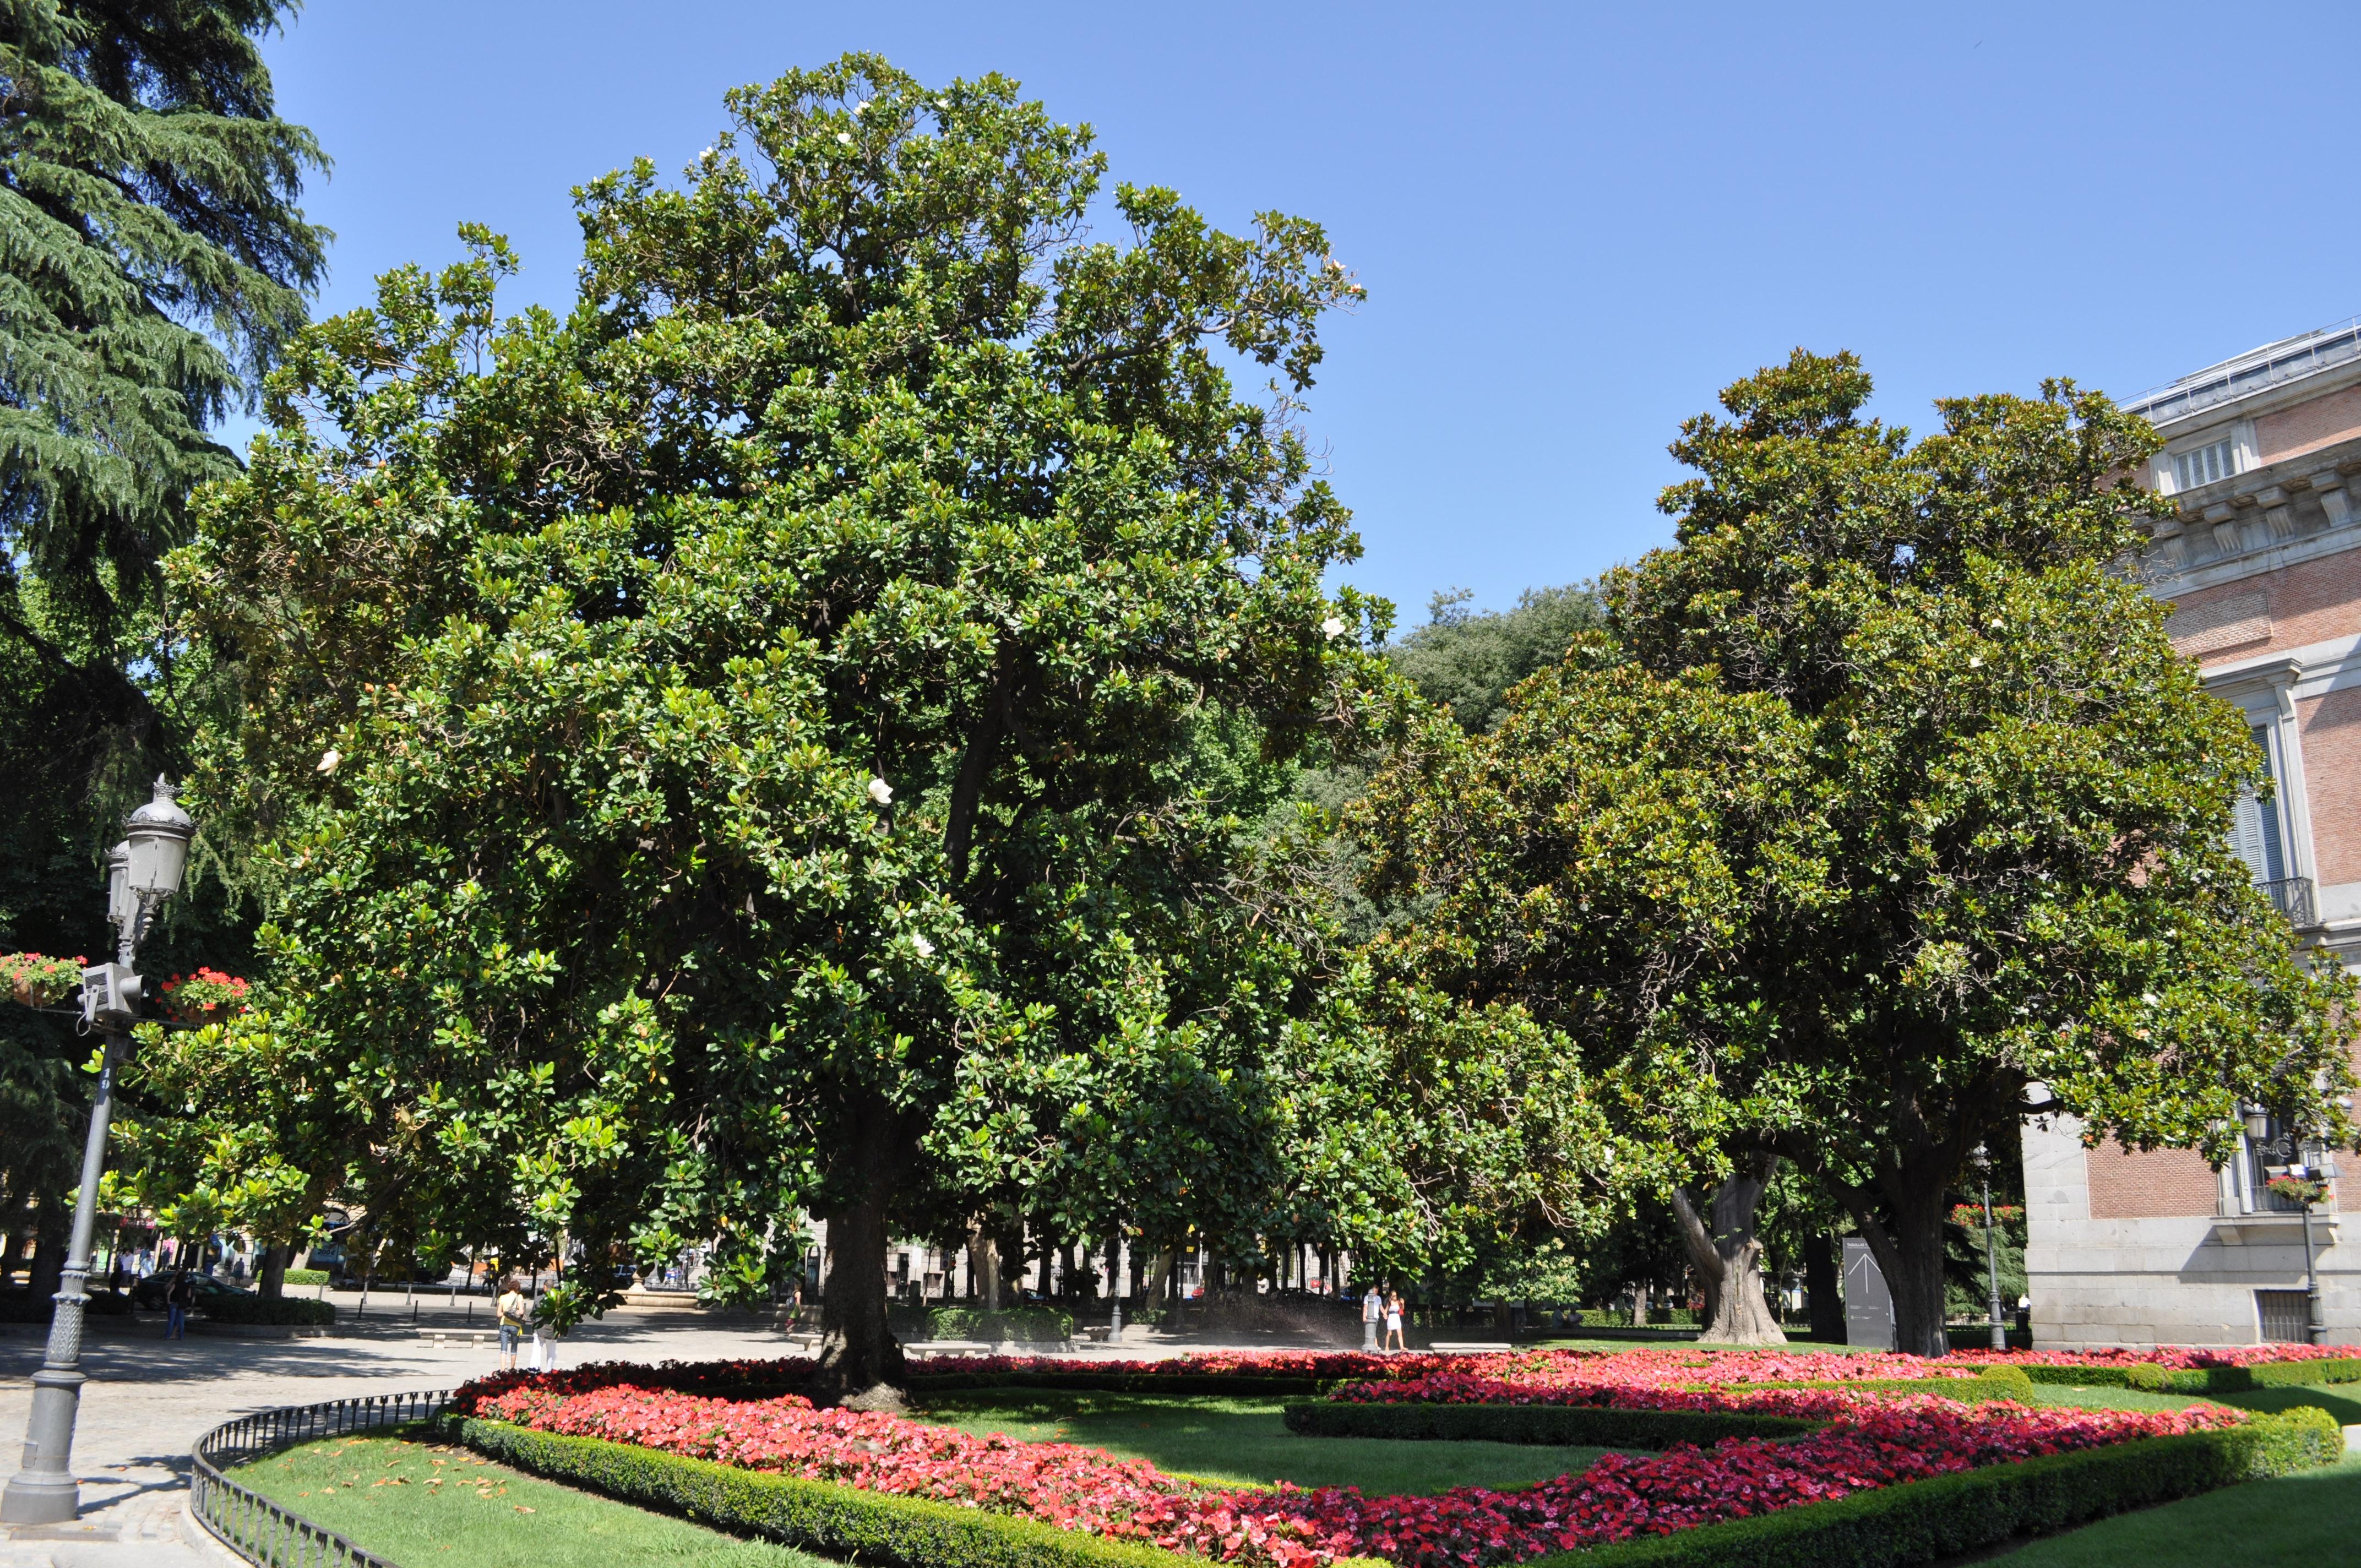 Arboles de jardin de hoja perenne excellent pinos jardin for Arboles de jardin de hoja perenne